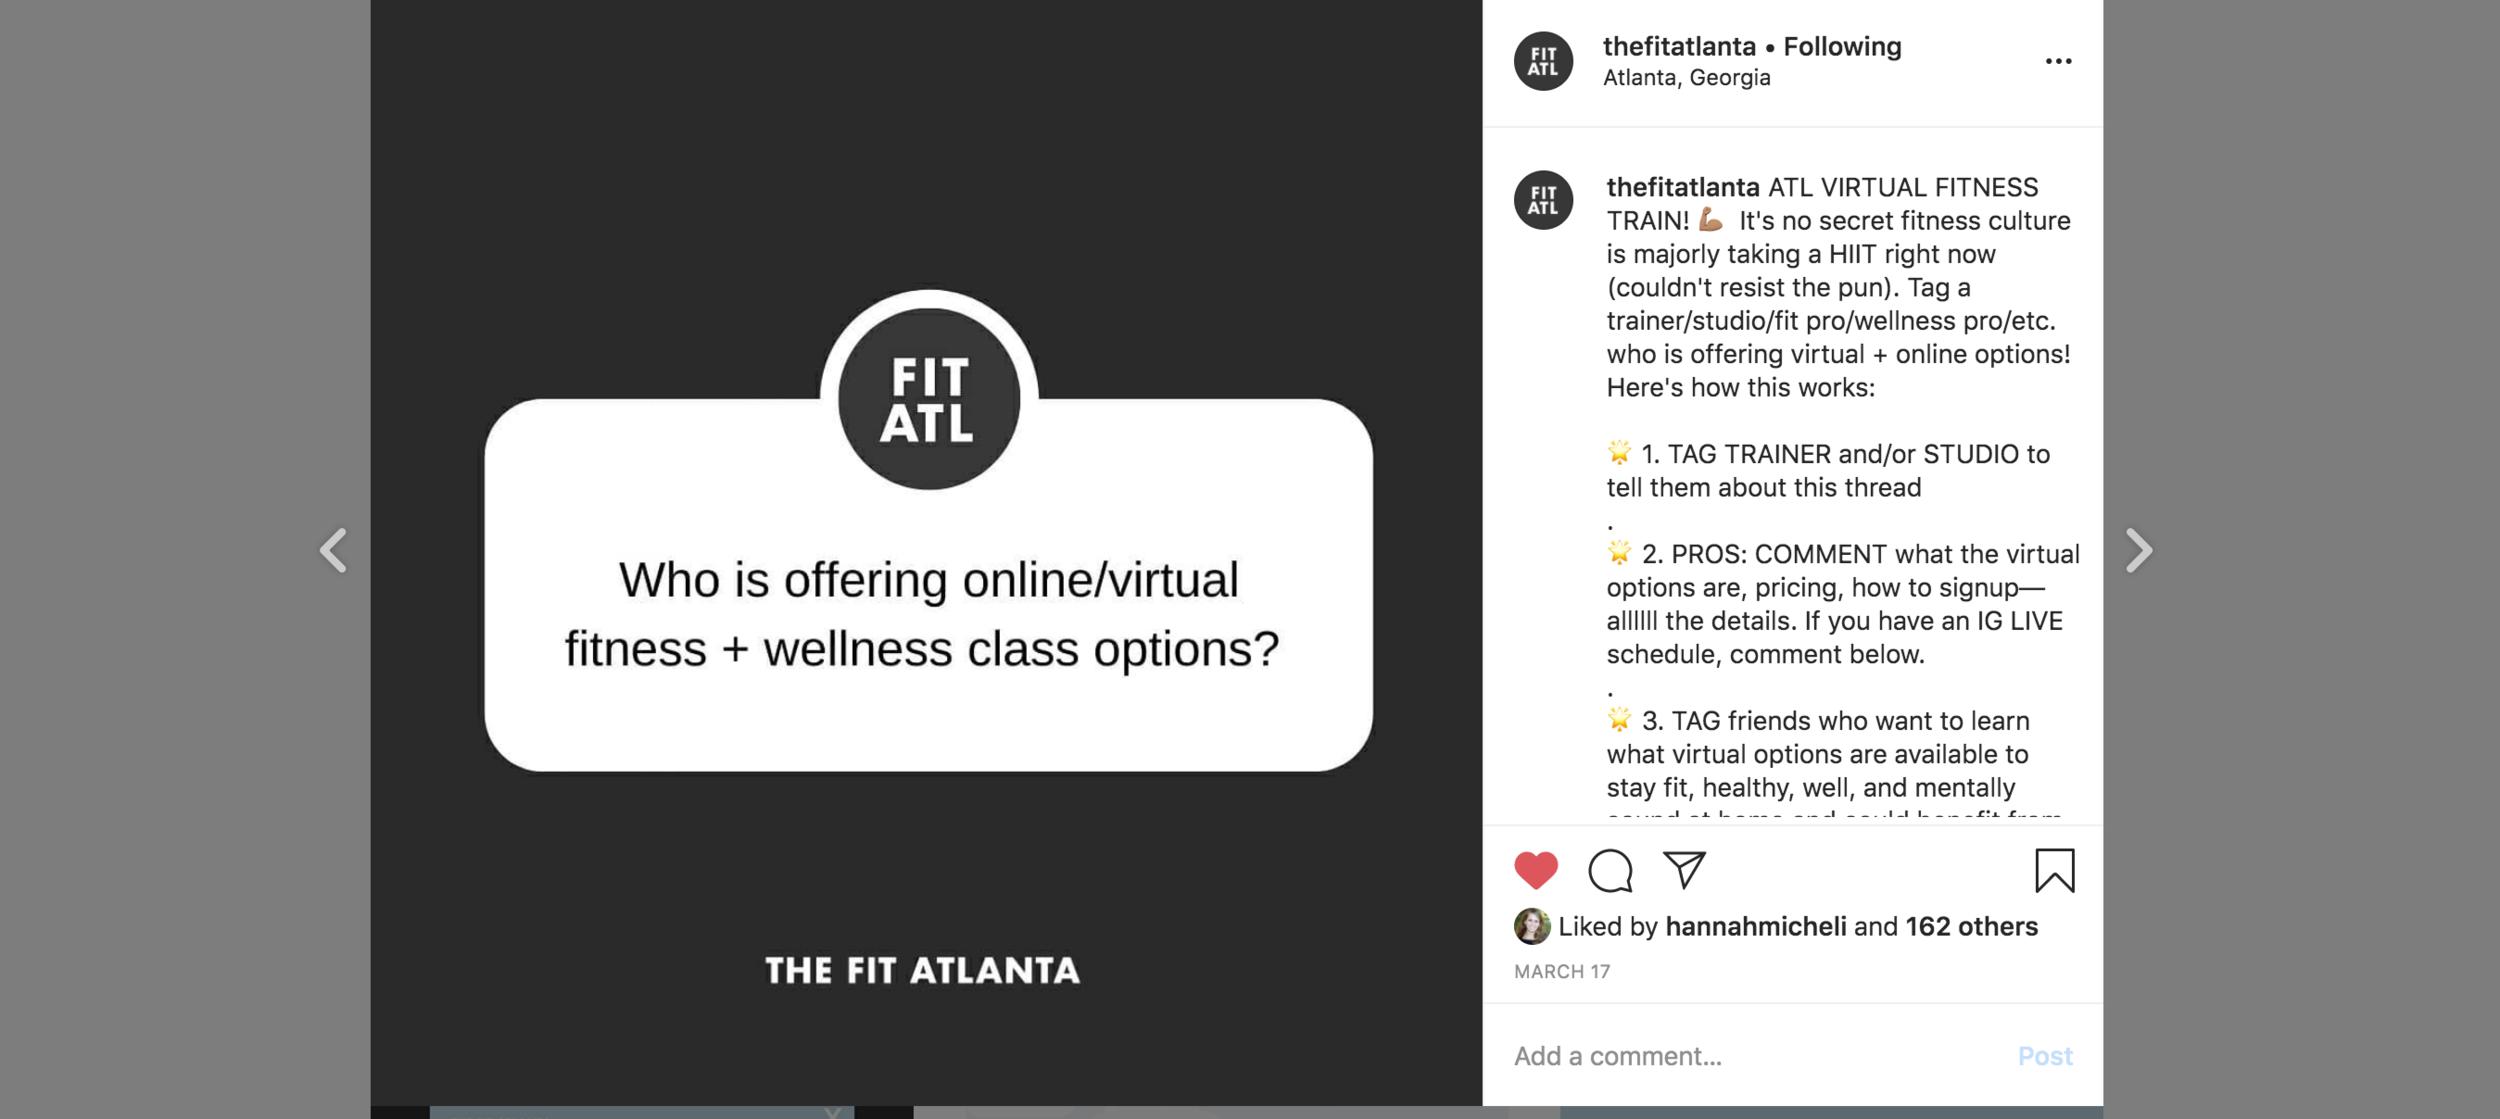 Call for virtual fitness classes in Atlanta on The Fit Atlanta Instagram